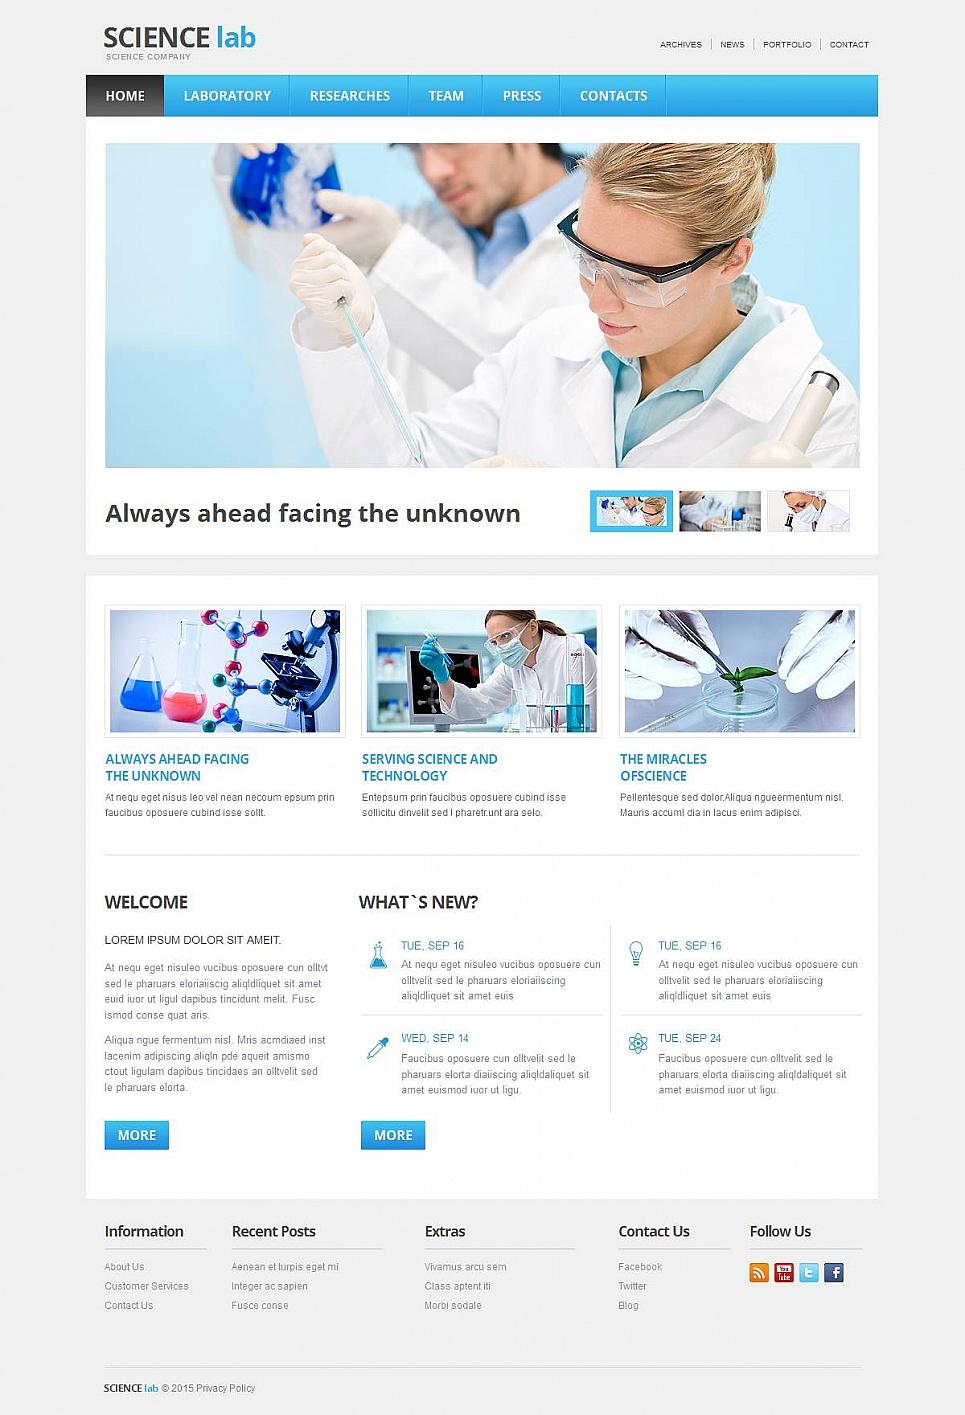 Science Laboratory Website Design - image